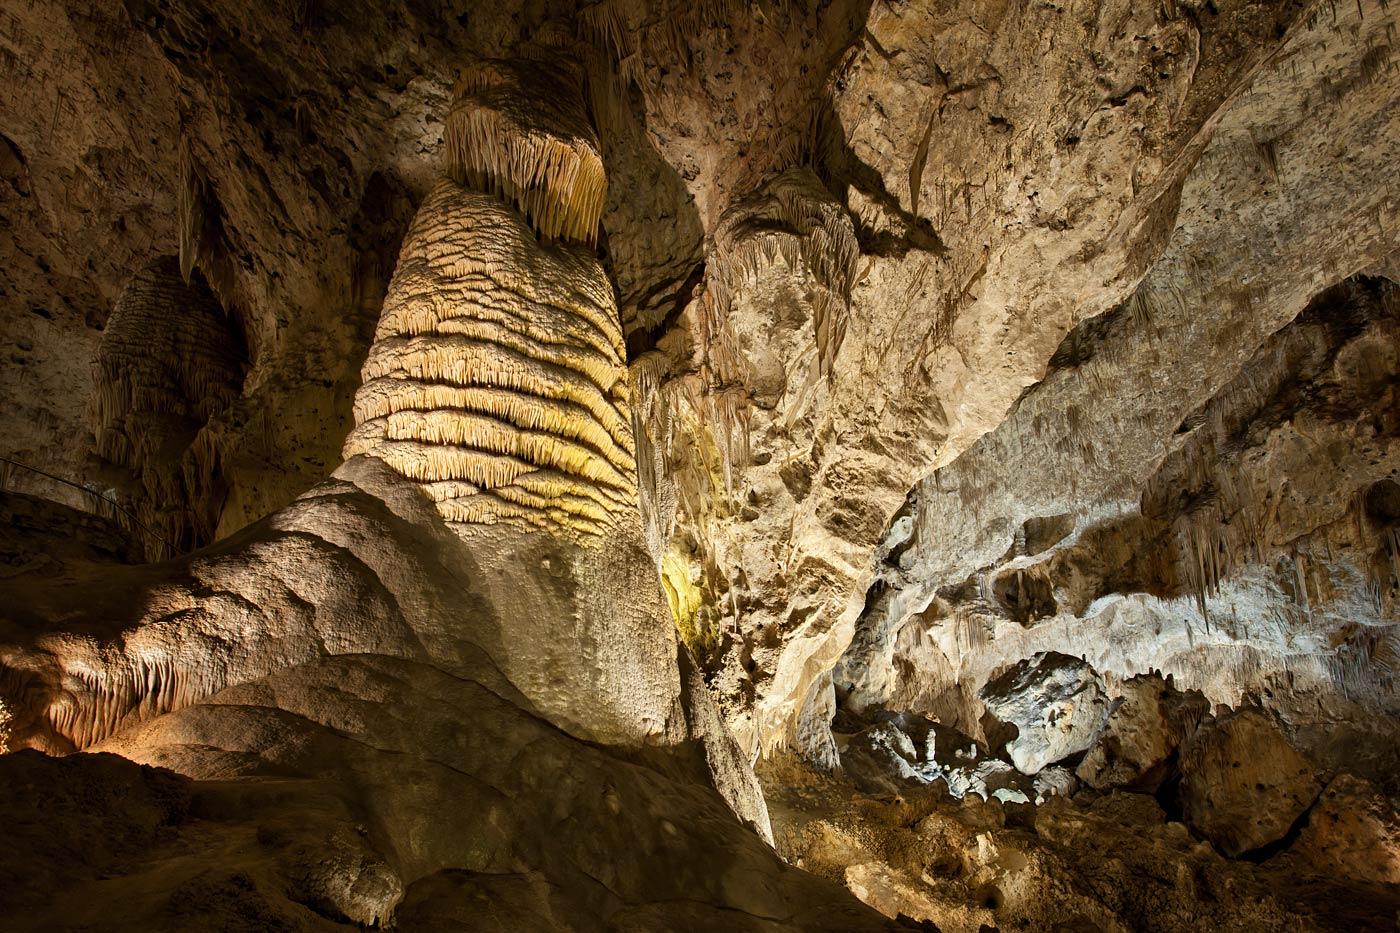 Carlsbad-Caverns-National-Park-ABP-Rock-of-Ages.jpg